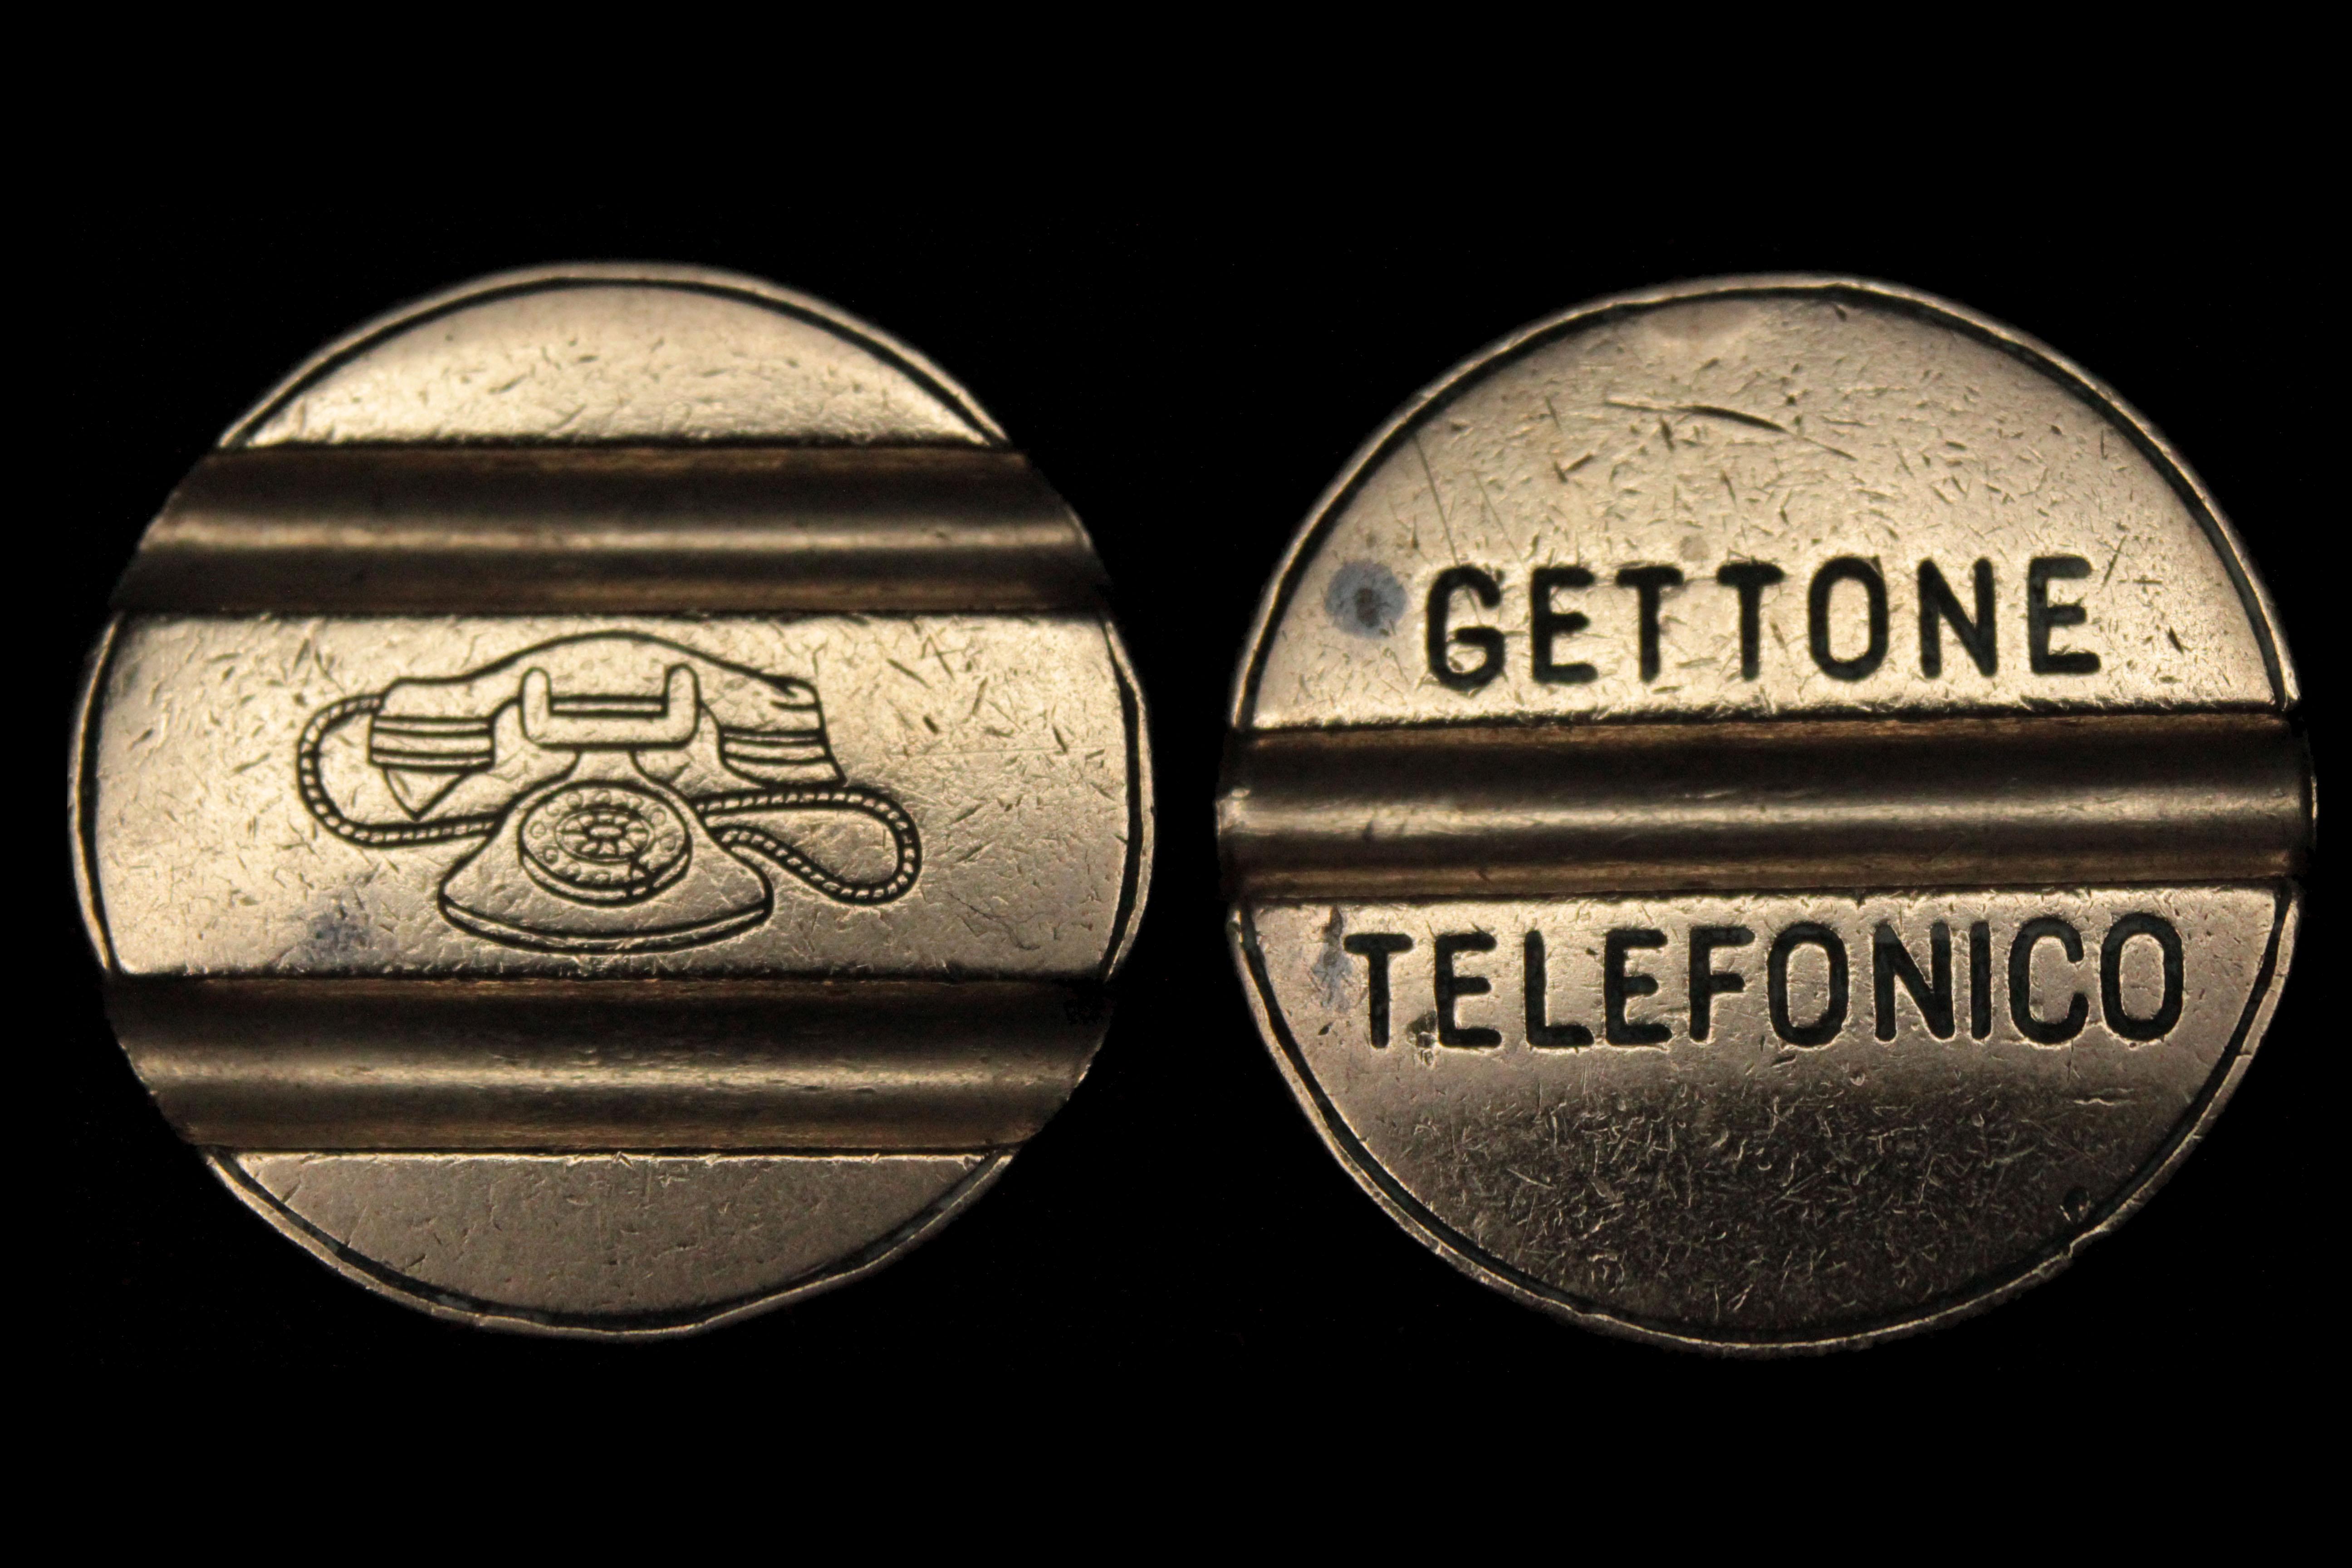 Cabina Telefonica : File:gettone per cabina telefonica italiana.jpg wikimedia commons